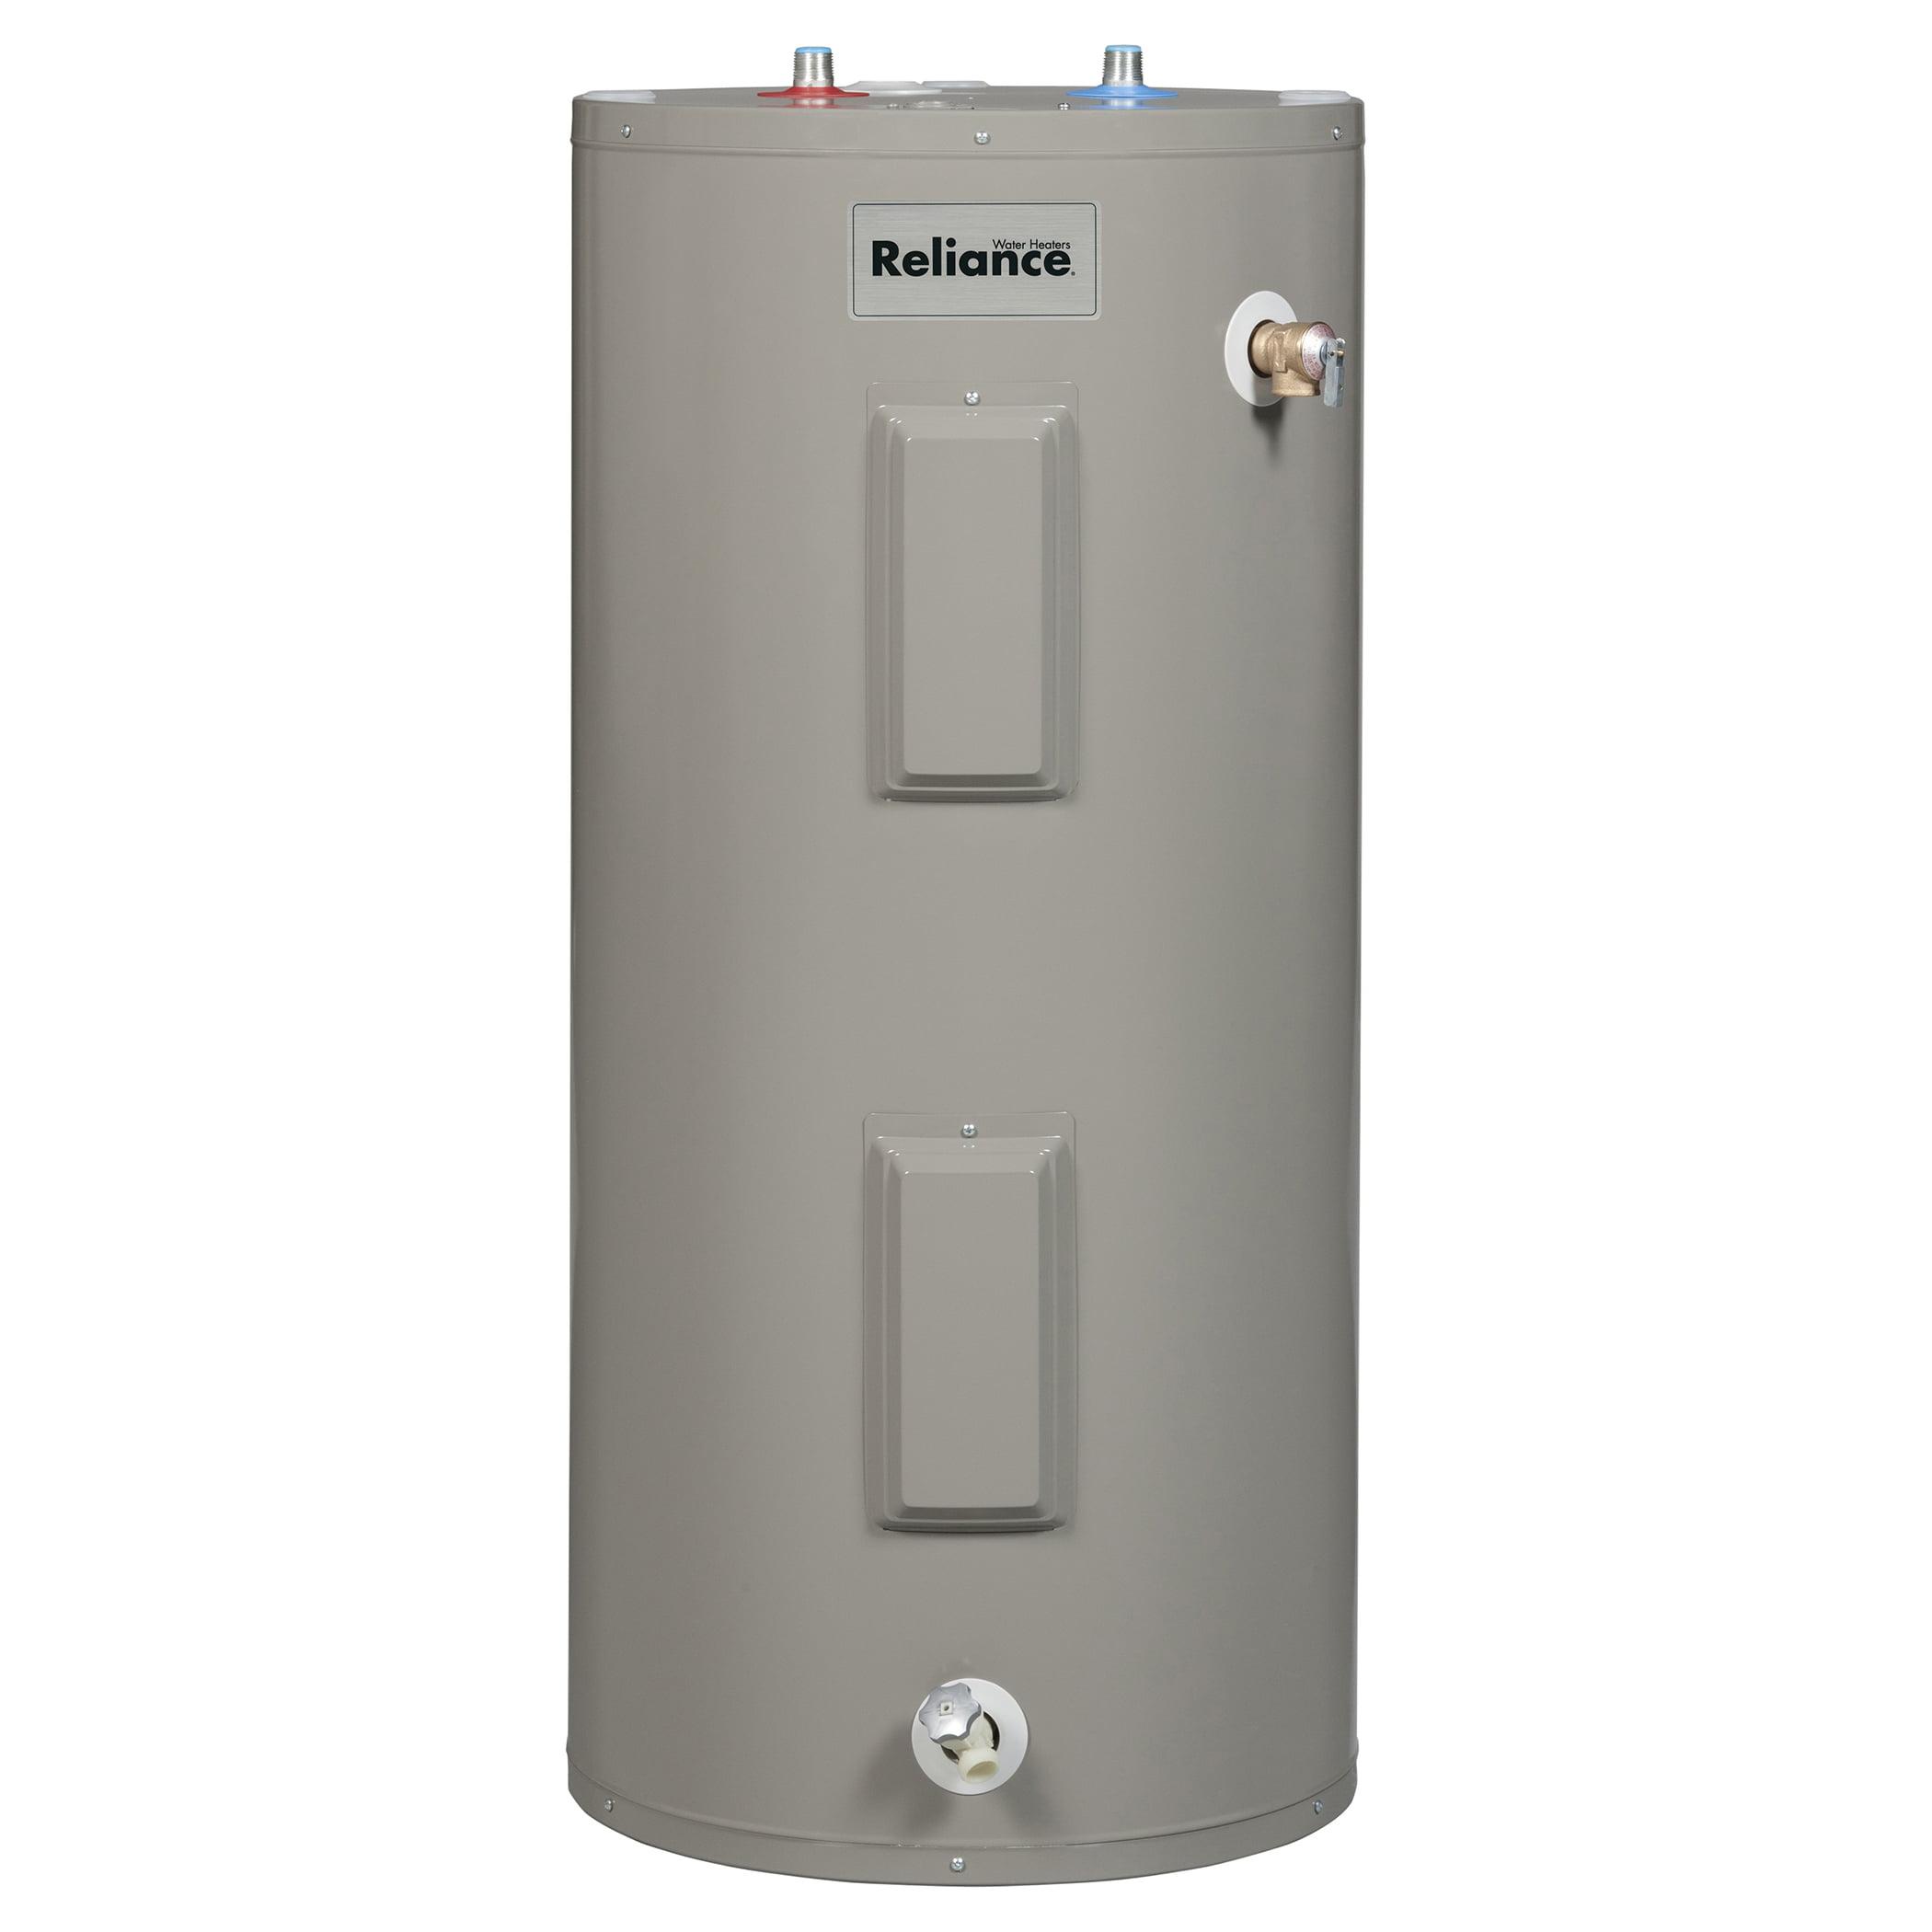 reliance 6 40 eors 40 gallon electric medium water heater - walmart